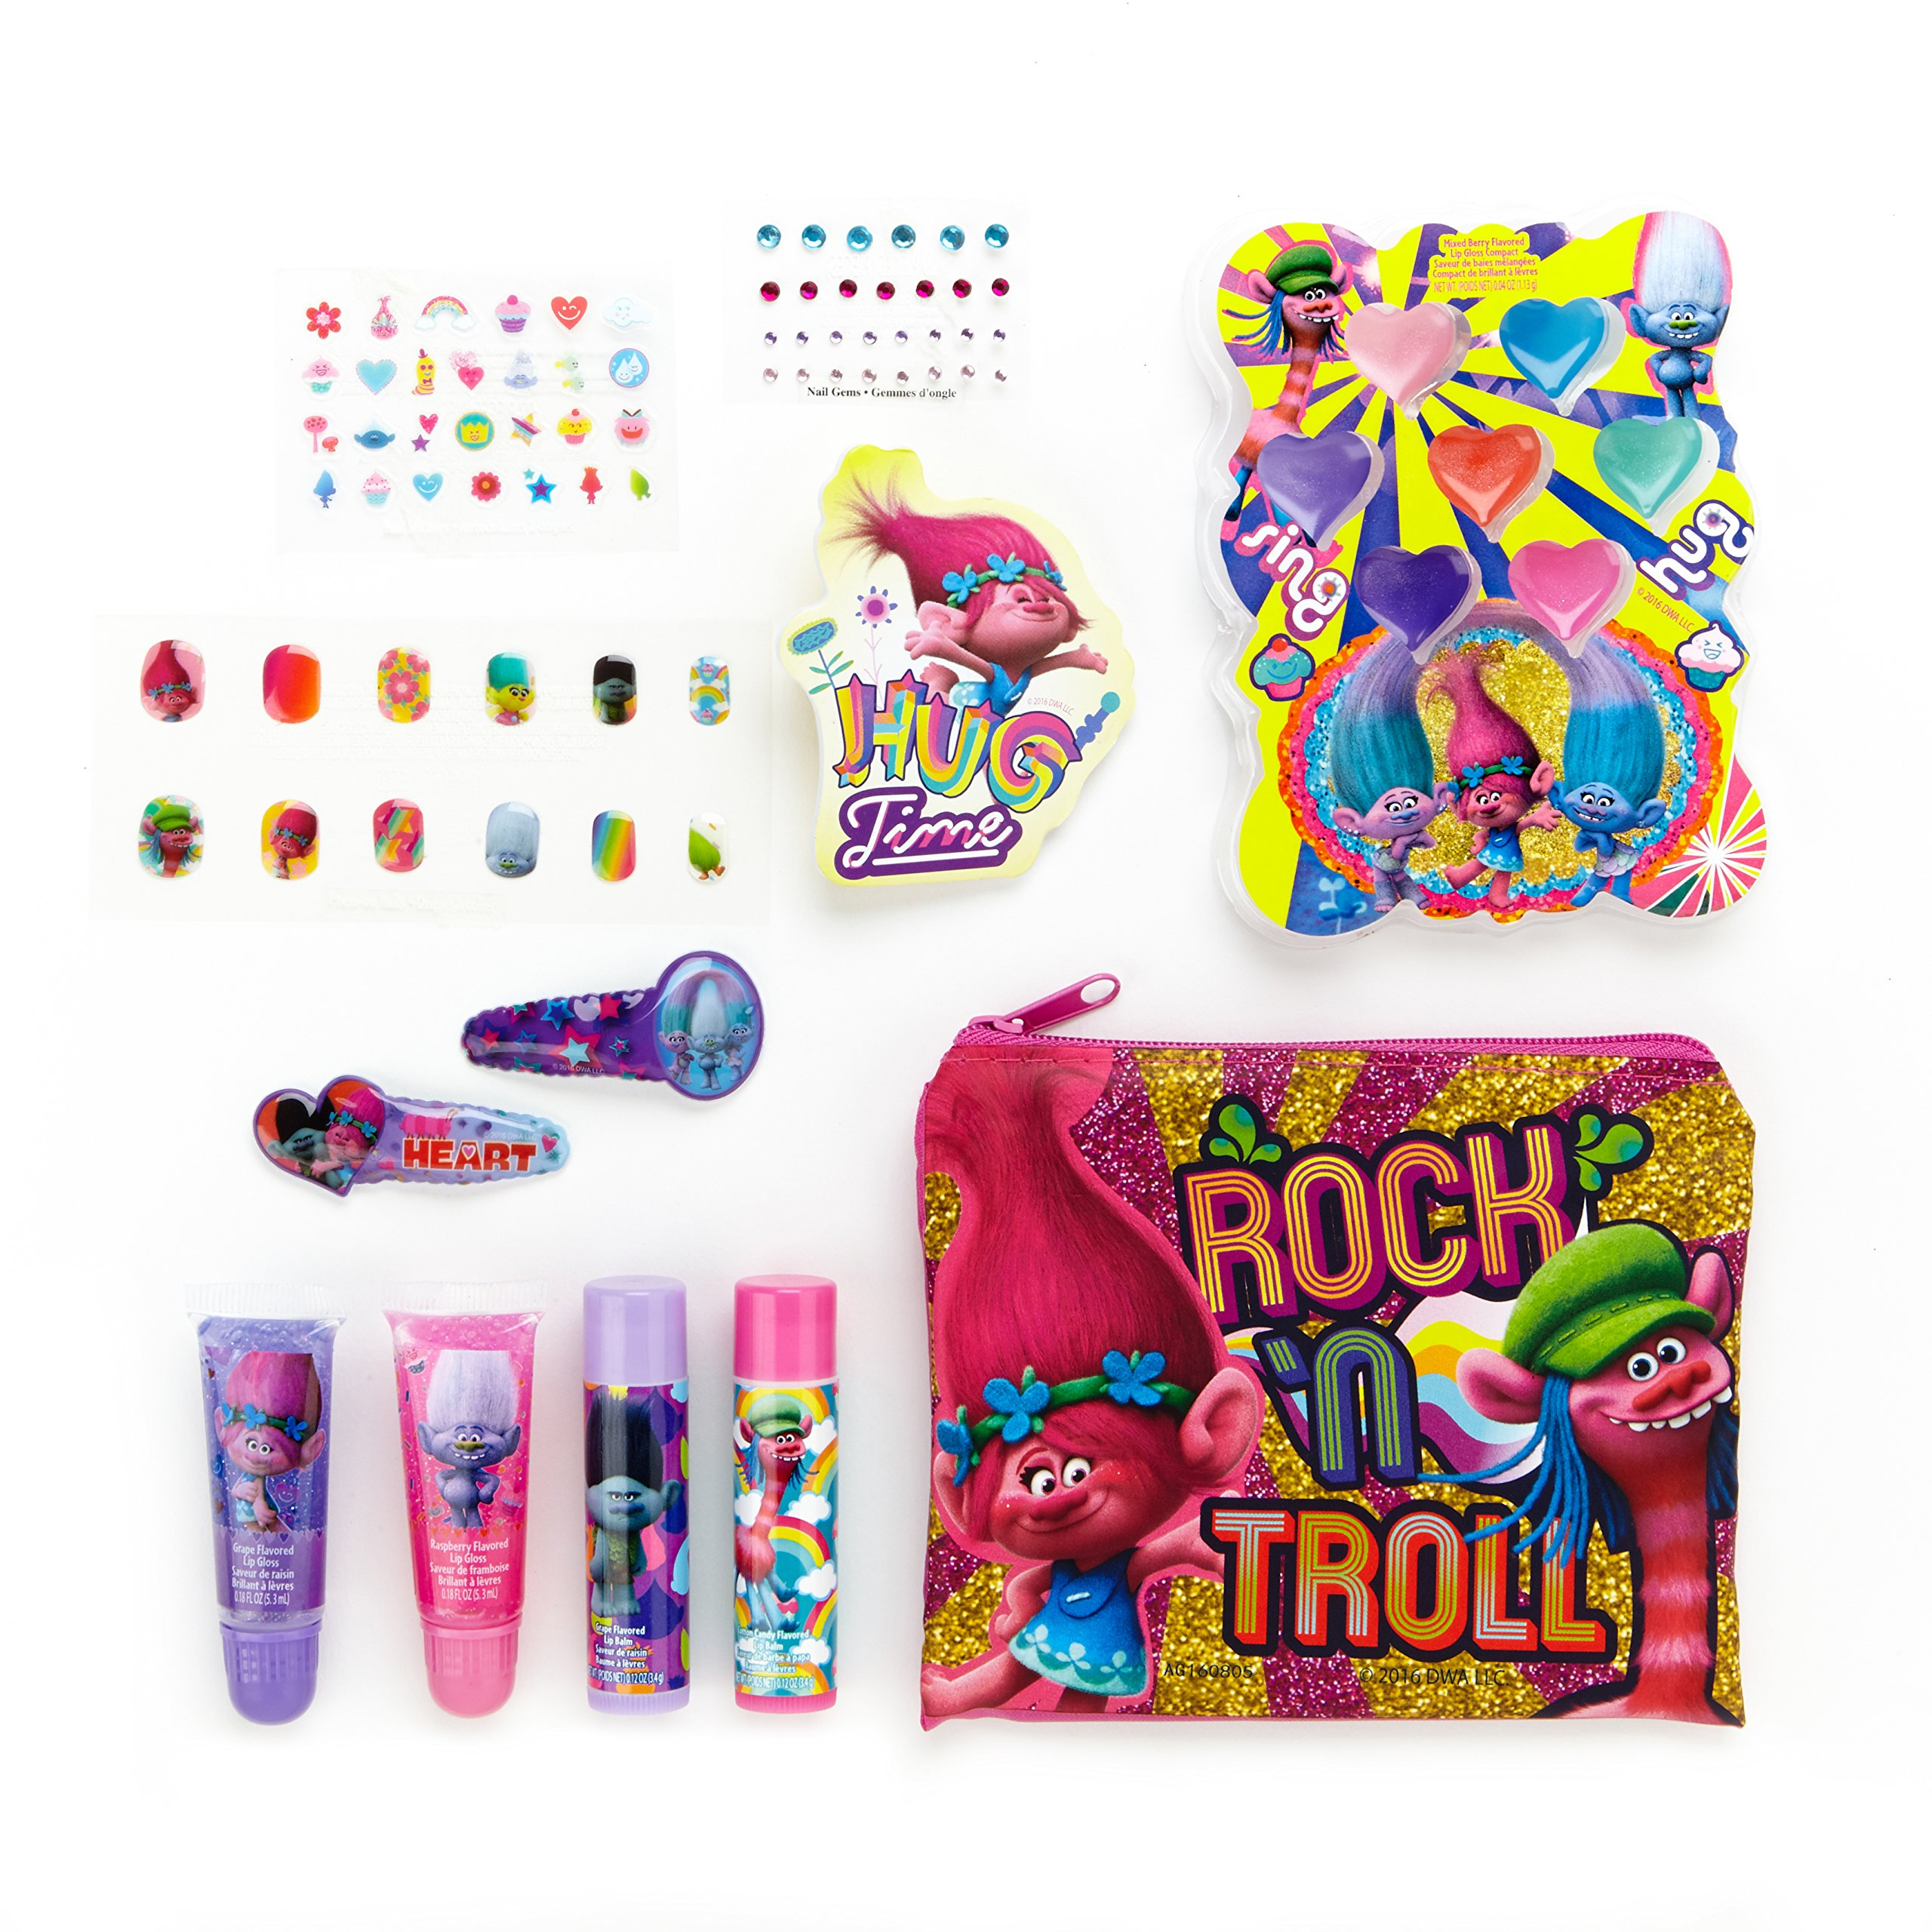 Buy Townley Girl Dreamworks Trolls Sparkly Lipgloss For